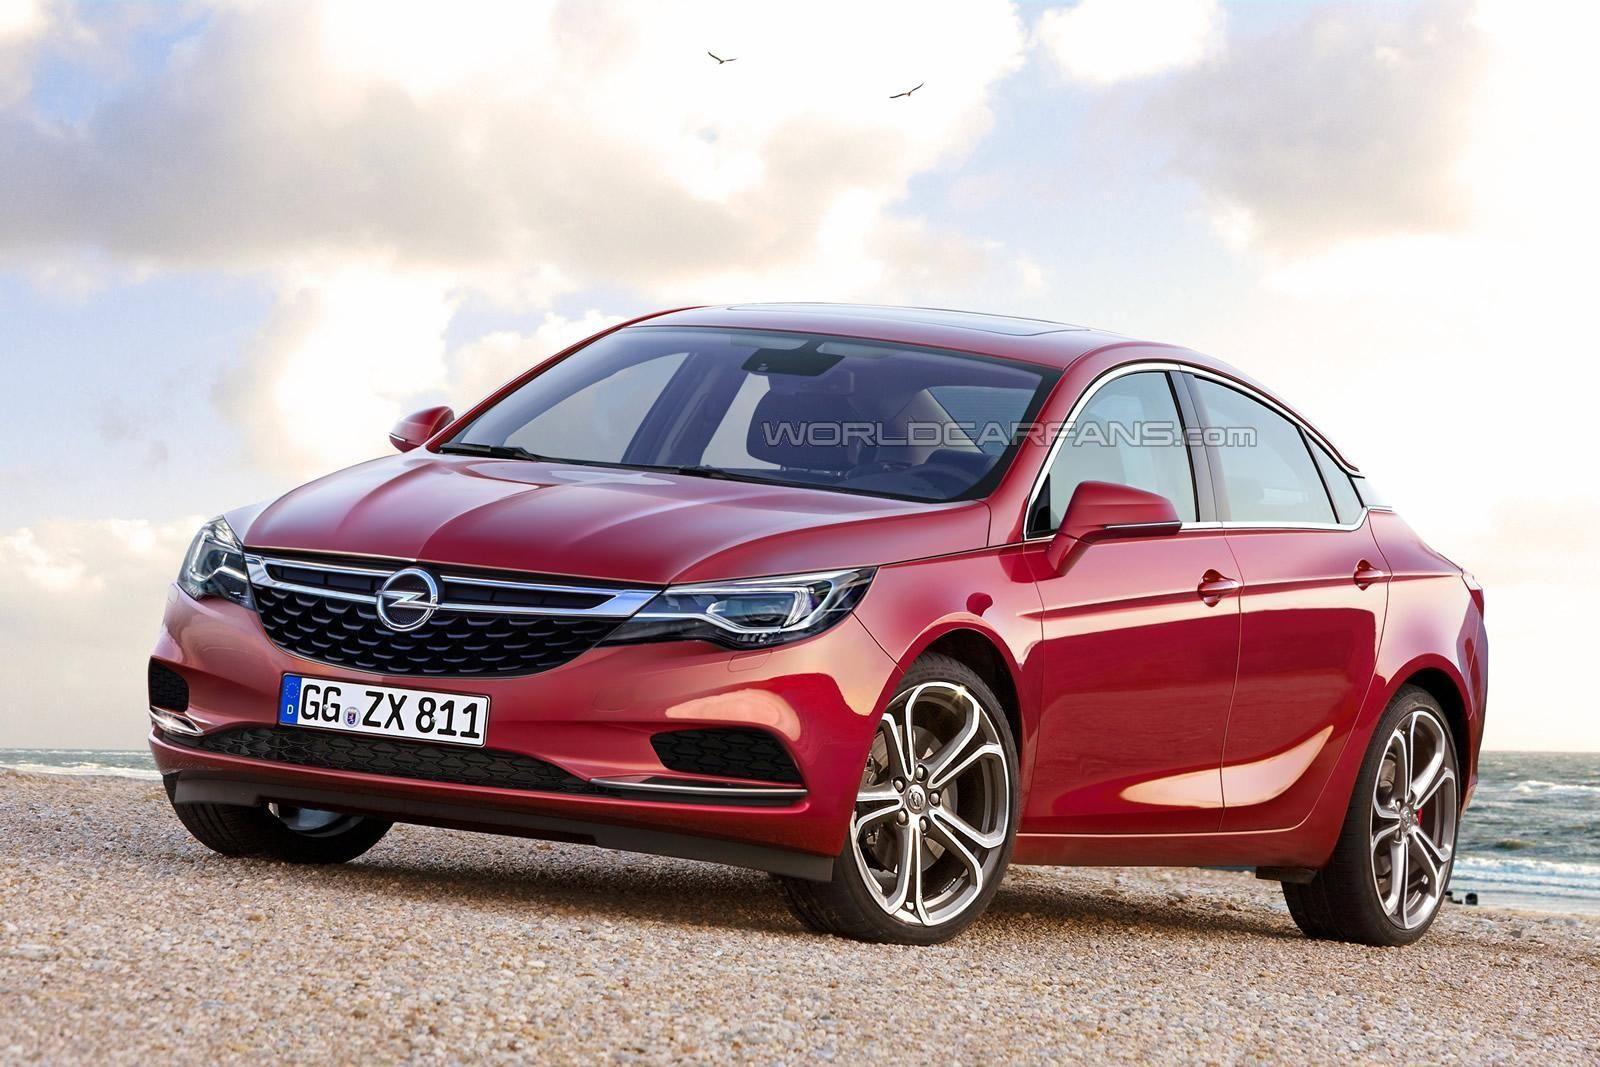 Opel Insignia 2017 Design And Interior Carsmid Opel Sedan Holden Astra